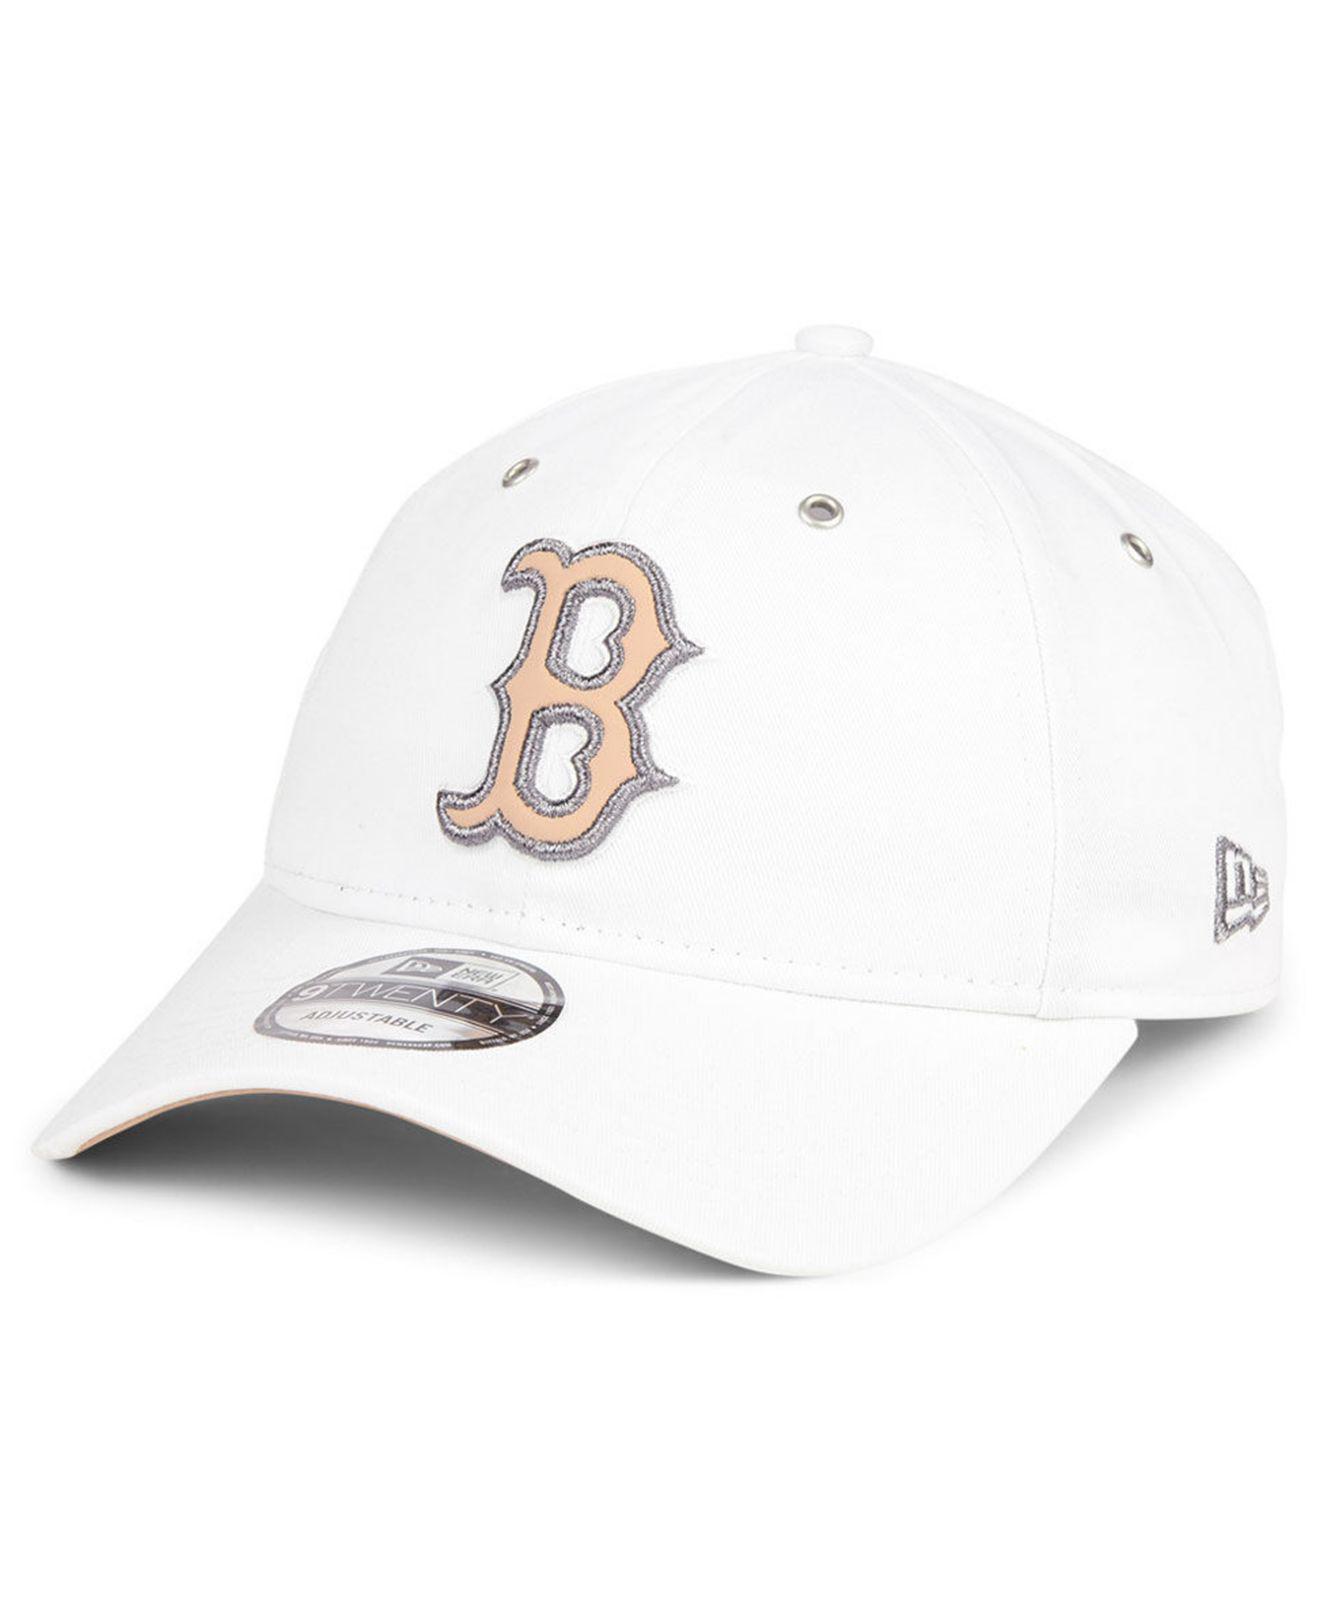 reputable site 4863a 1f701 KTZ Boston Red Sox Metallic Pastel 9twenty Cap in White - Lyst